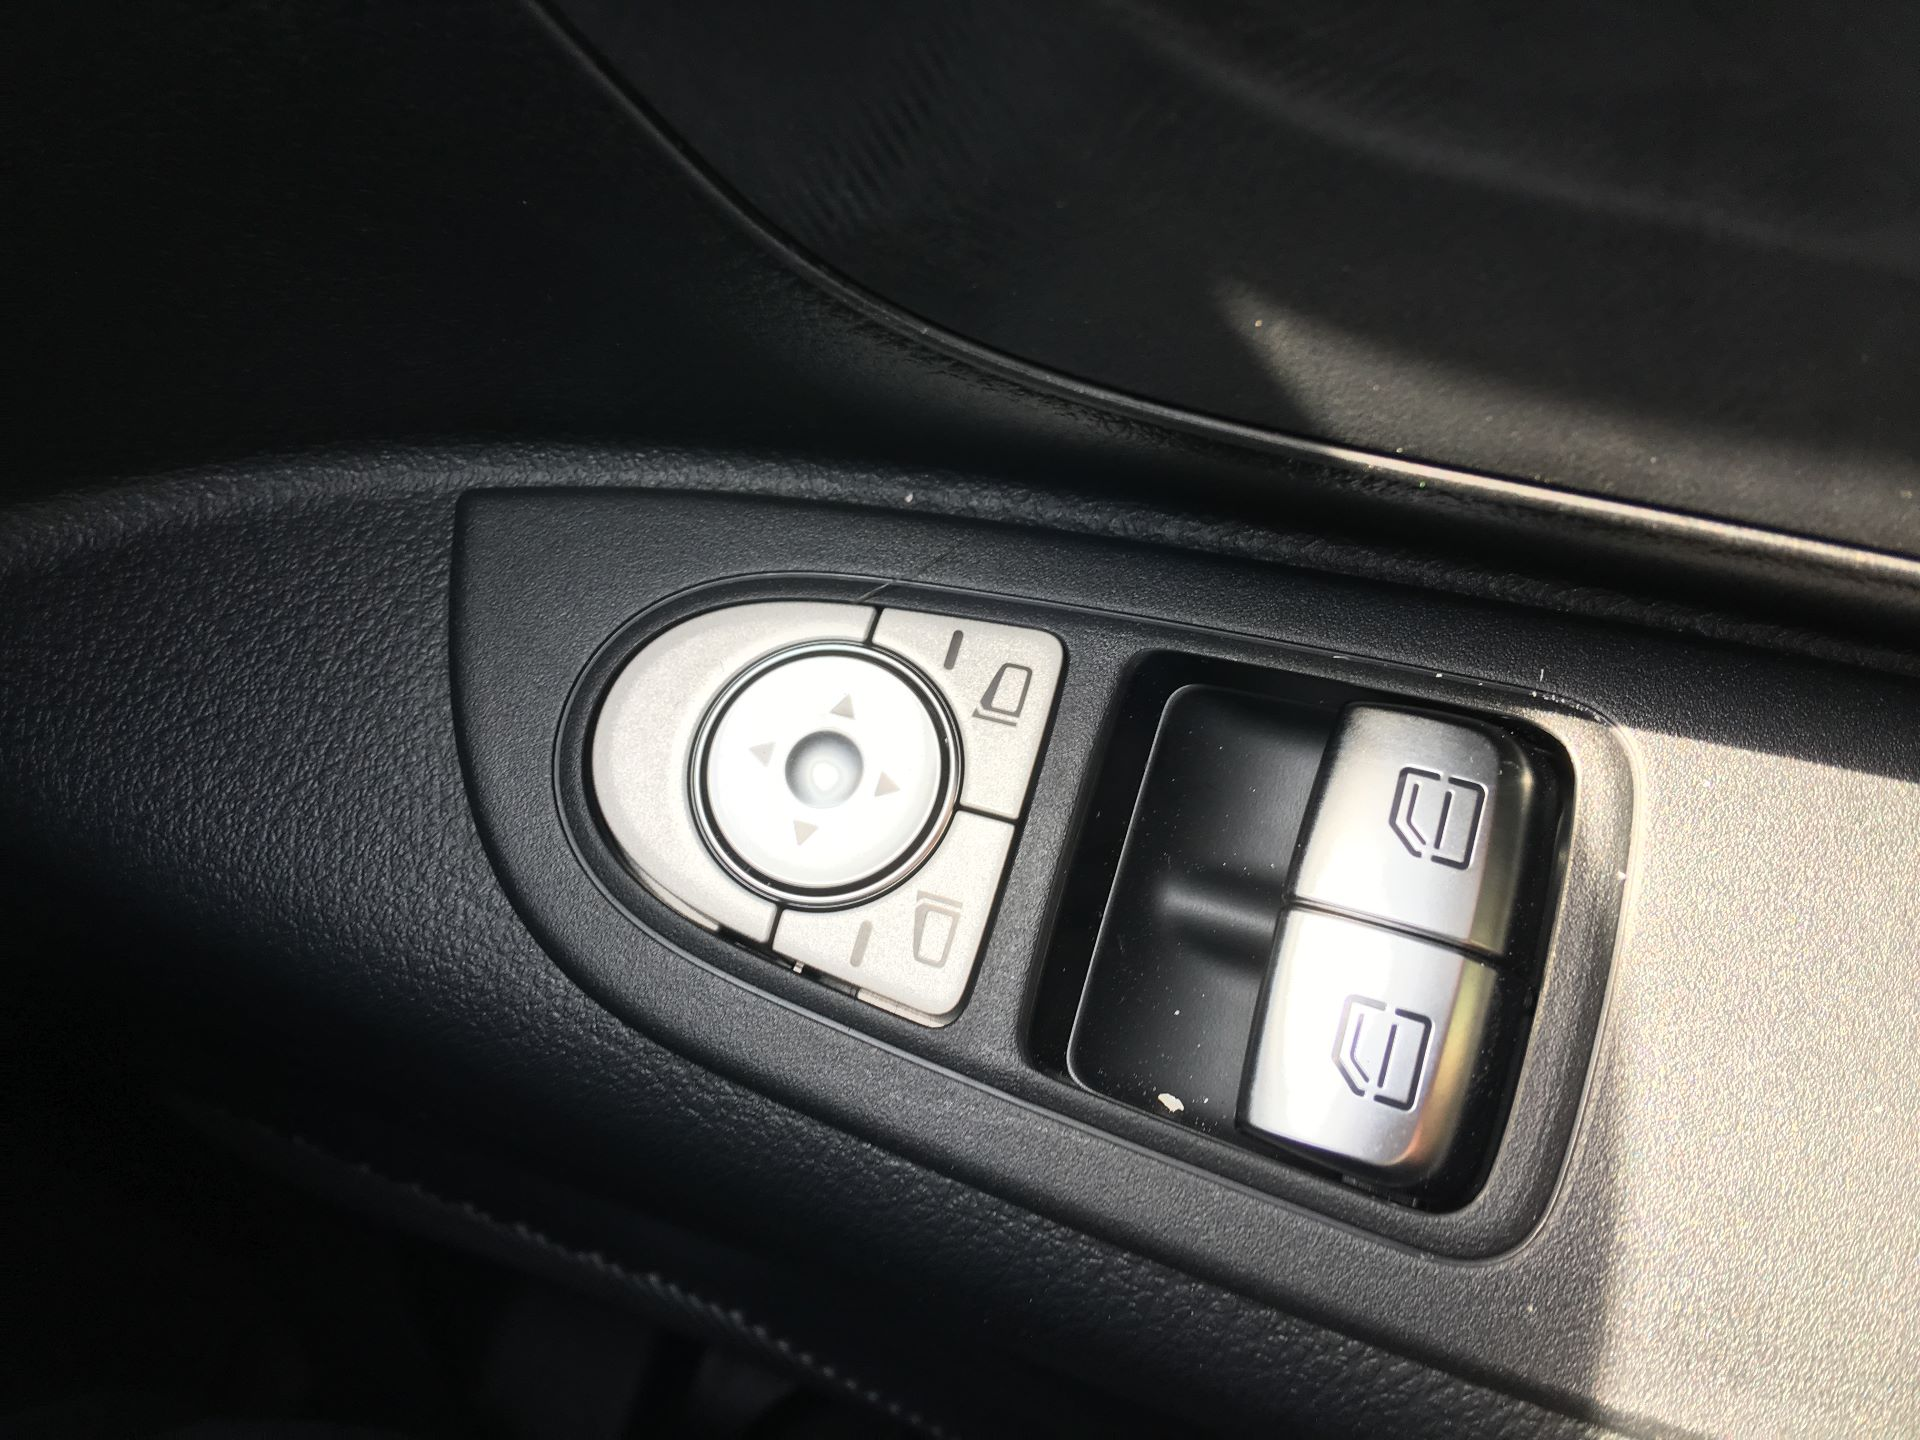 2019 Mercedes-Benz Vito LONG 111 CDI VAN EURO 5/6 (YN19ZGM) Image 8